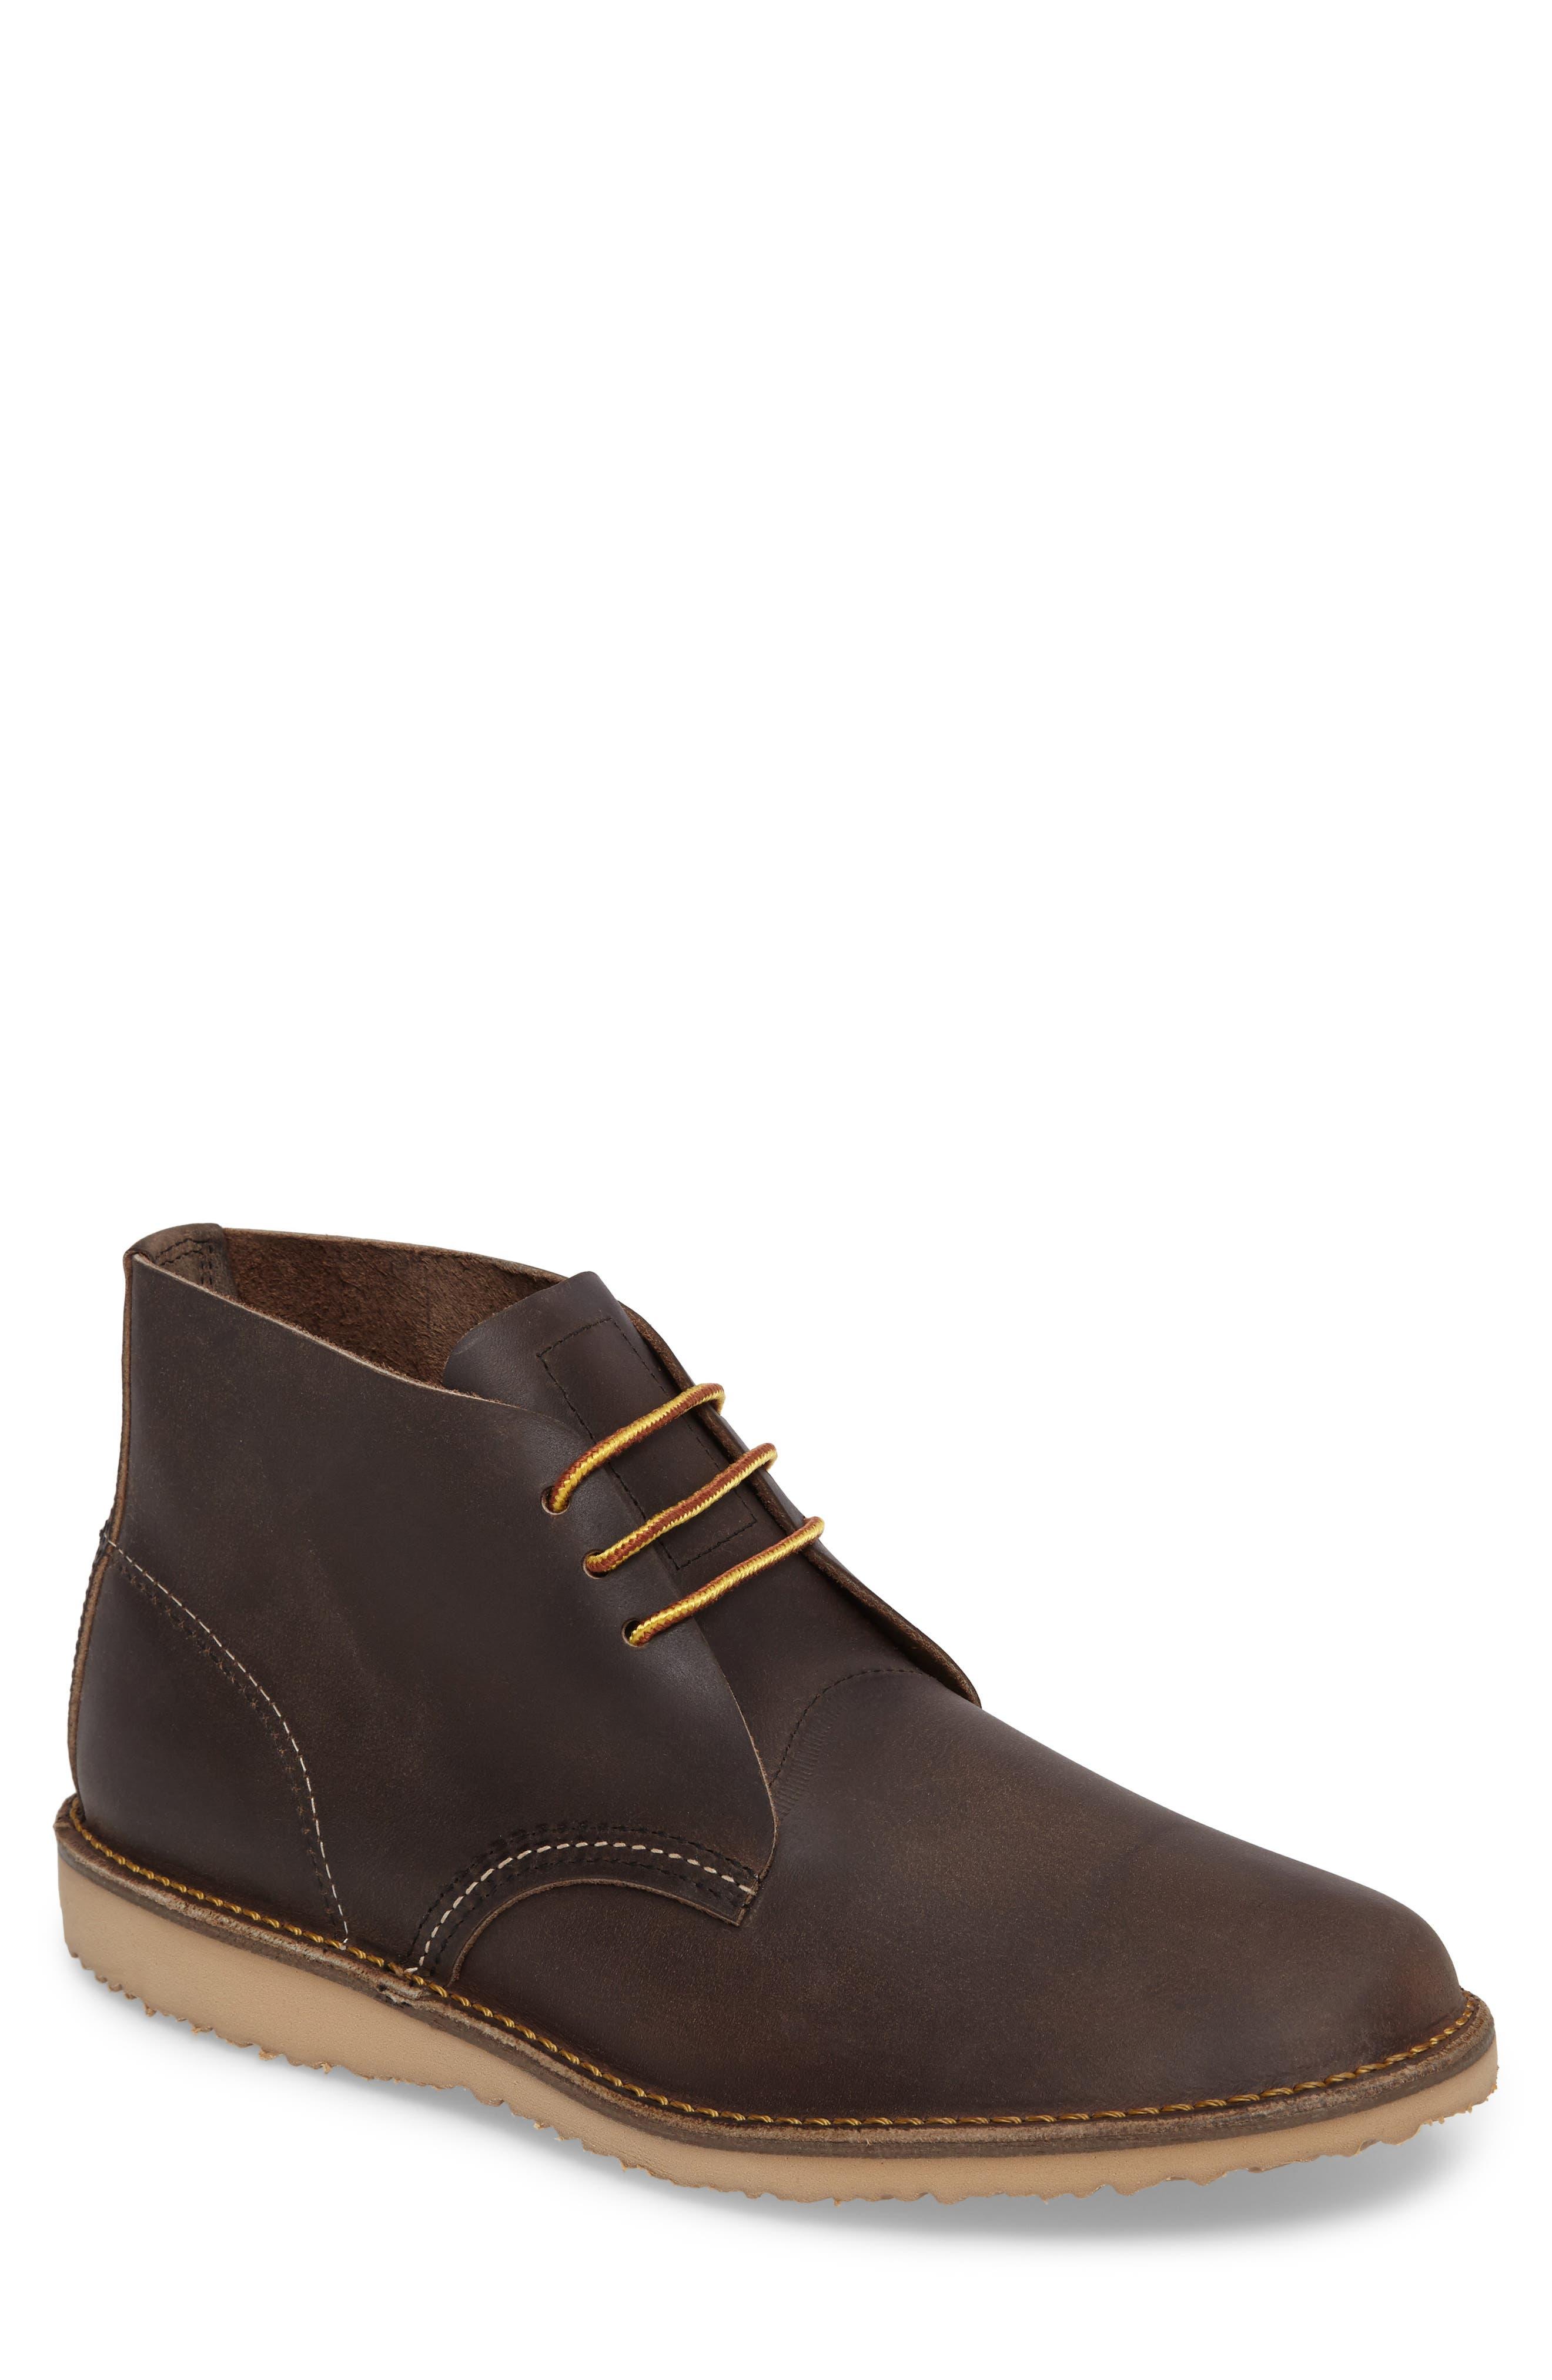 Chukka Boot, Main, color, CONCRETE LEATHER